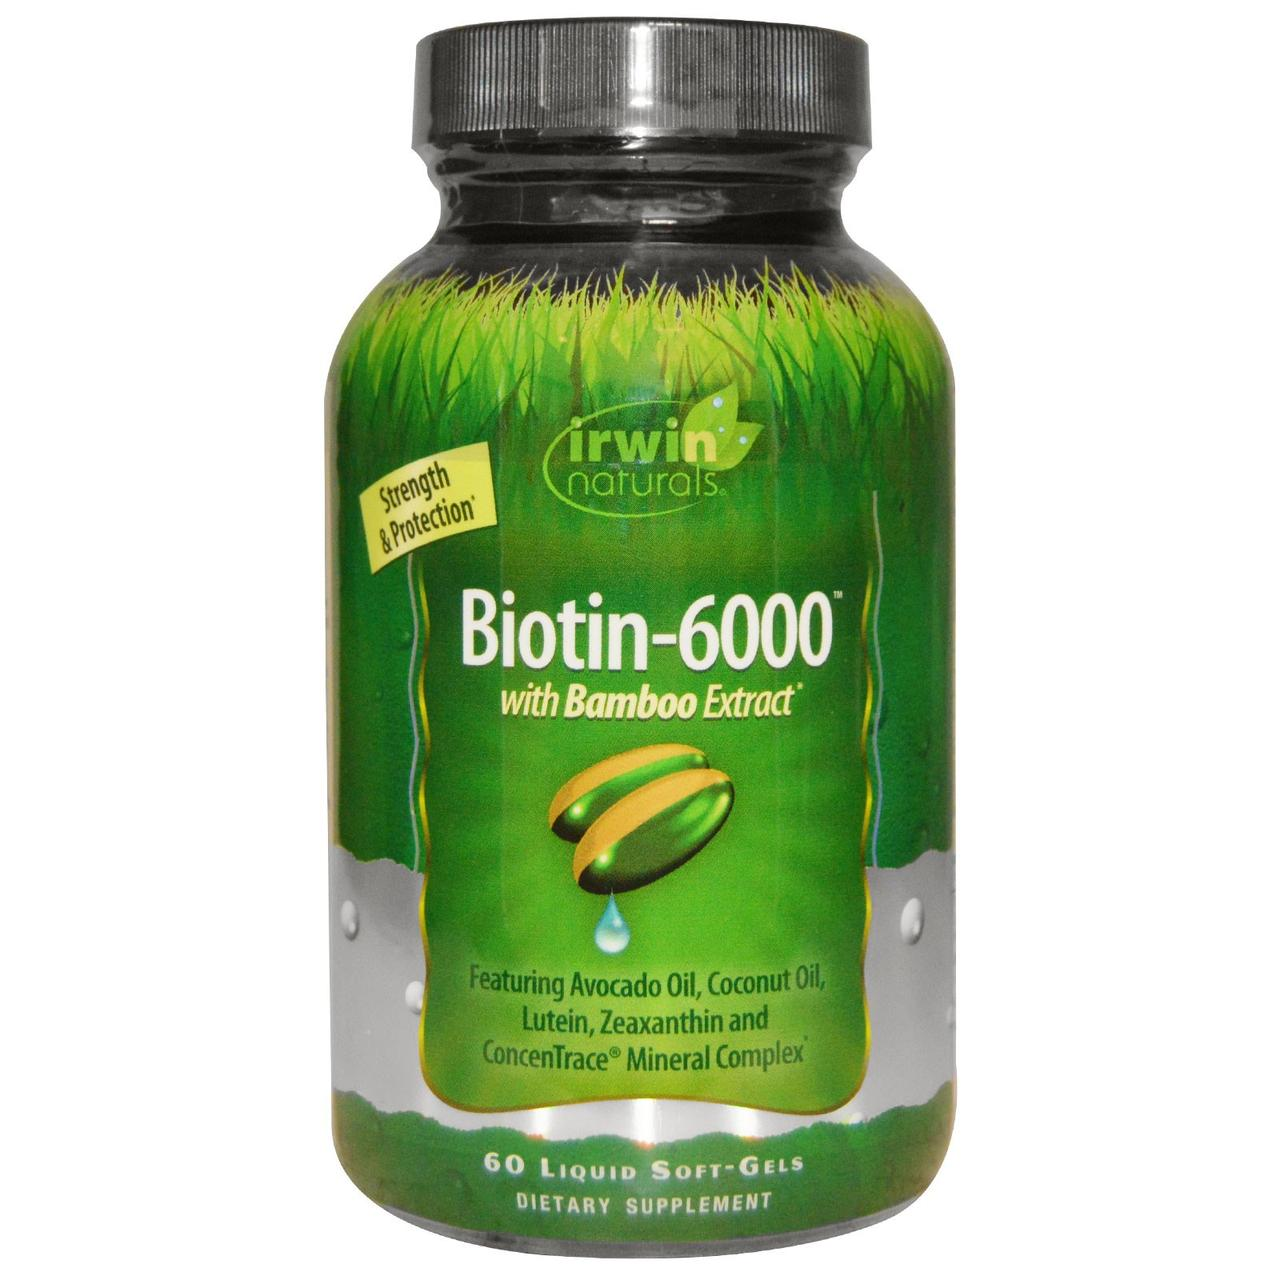 Irwin Naturals, Биотин-6000, С экстрактом бамбука, 60 жидких капсул